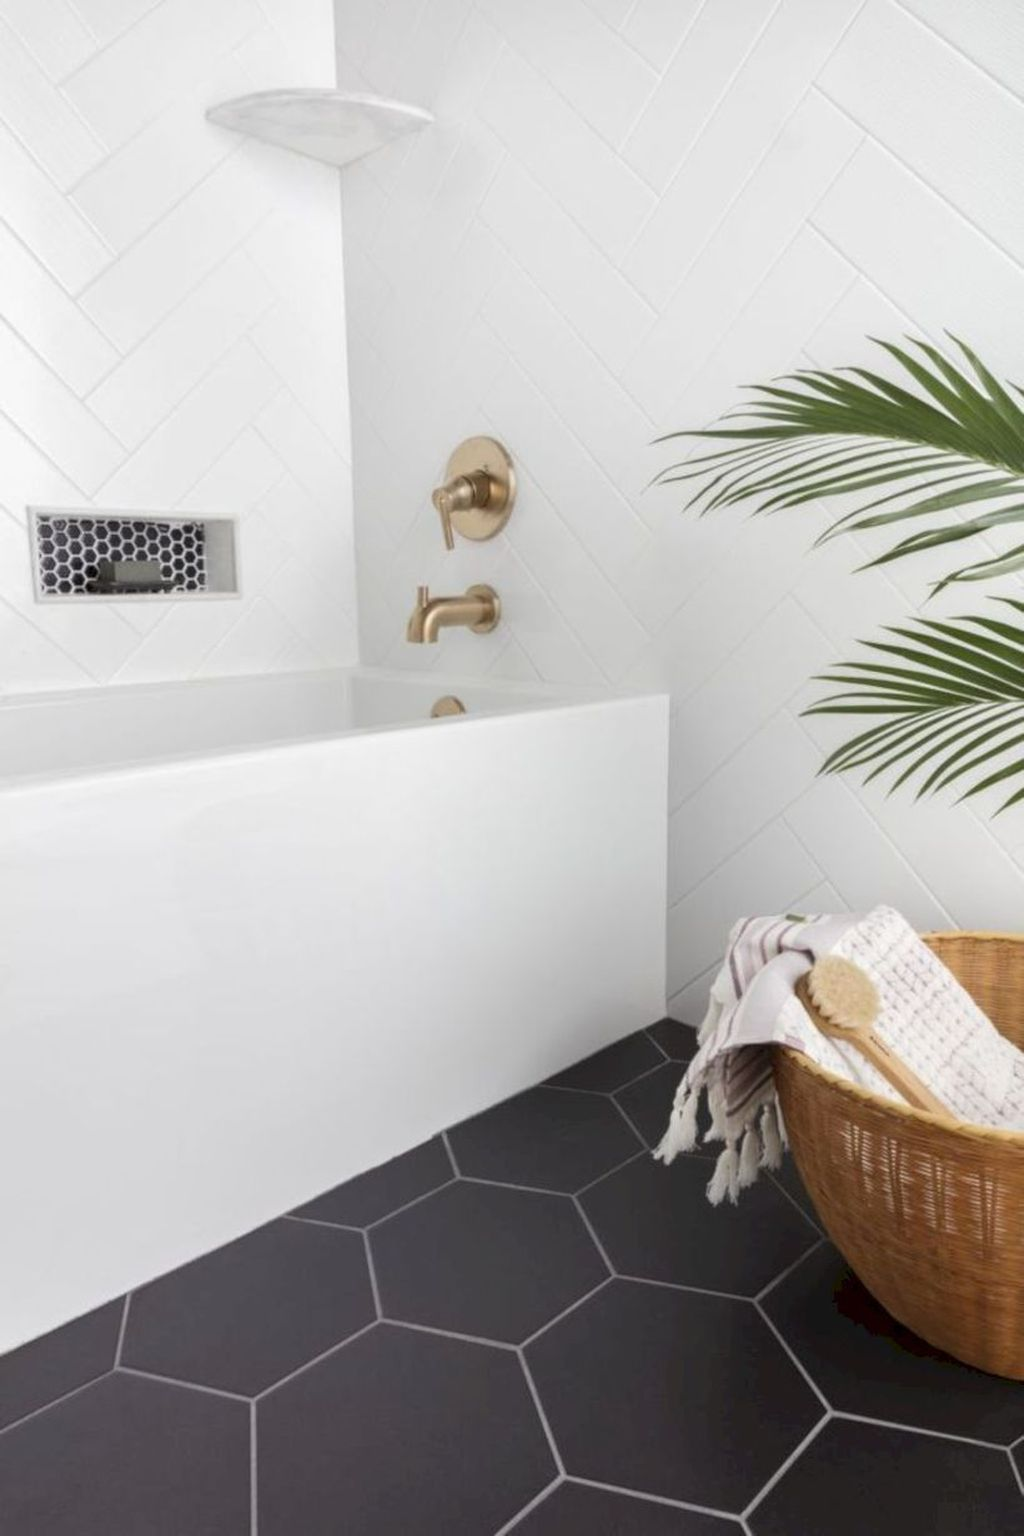 Inspiring Bathroom Tile Ideas 25